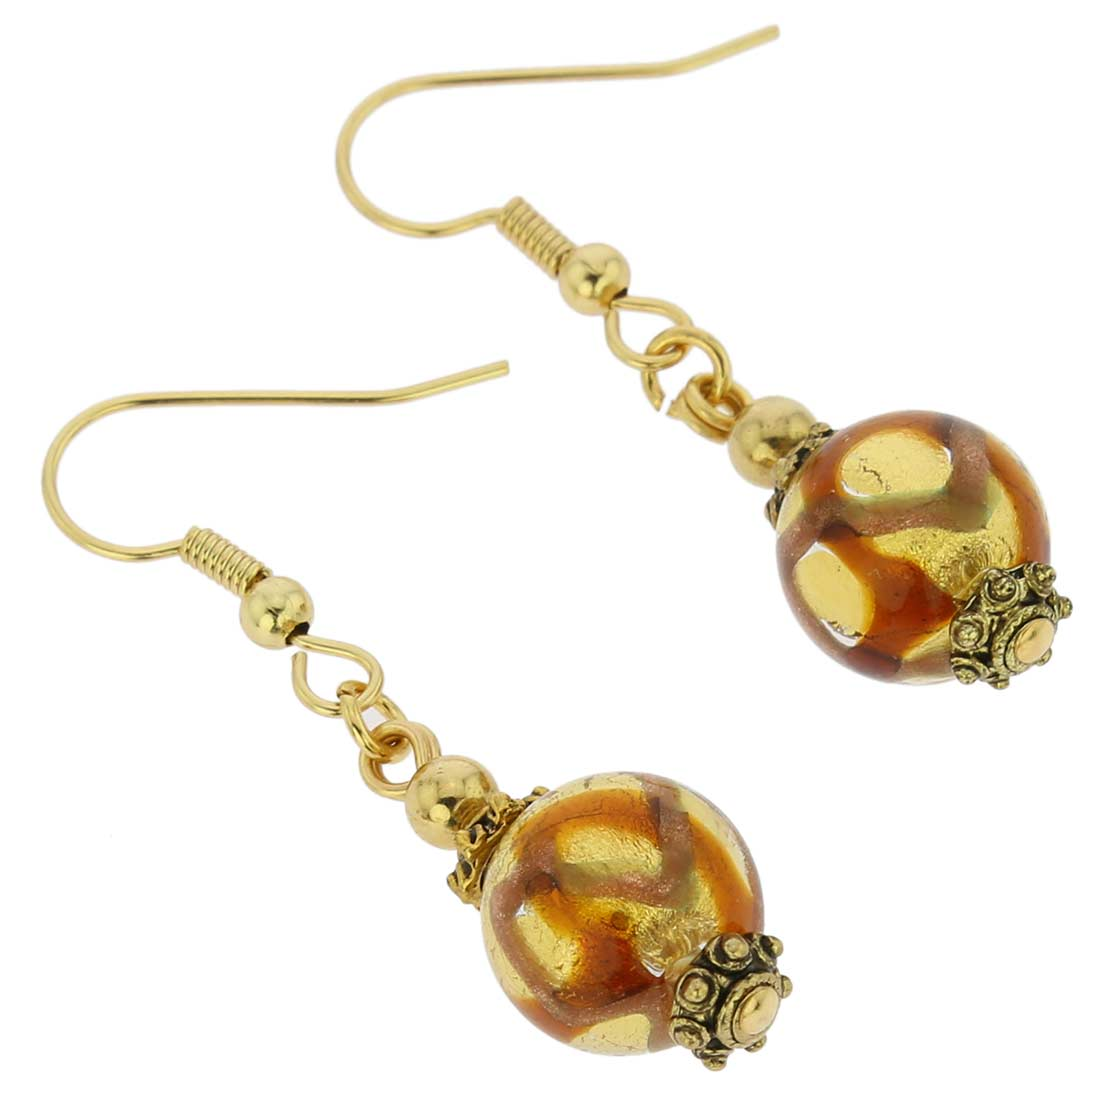 Antico Tesoro Balls Earrings - Topaz Waves Gold